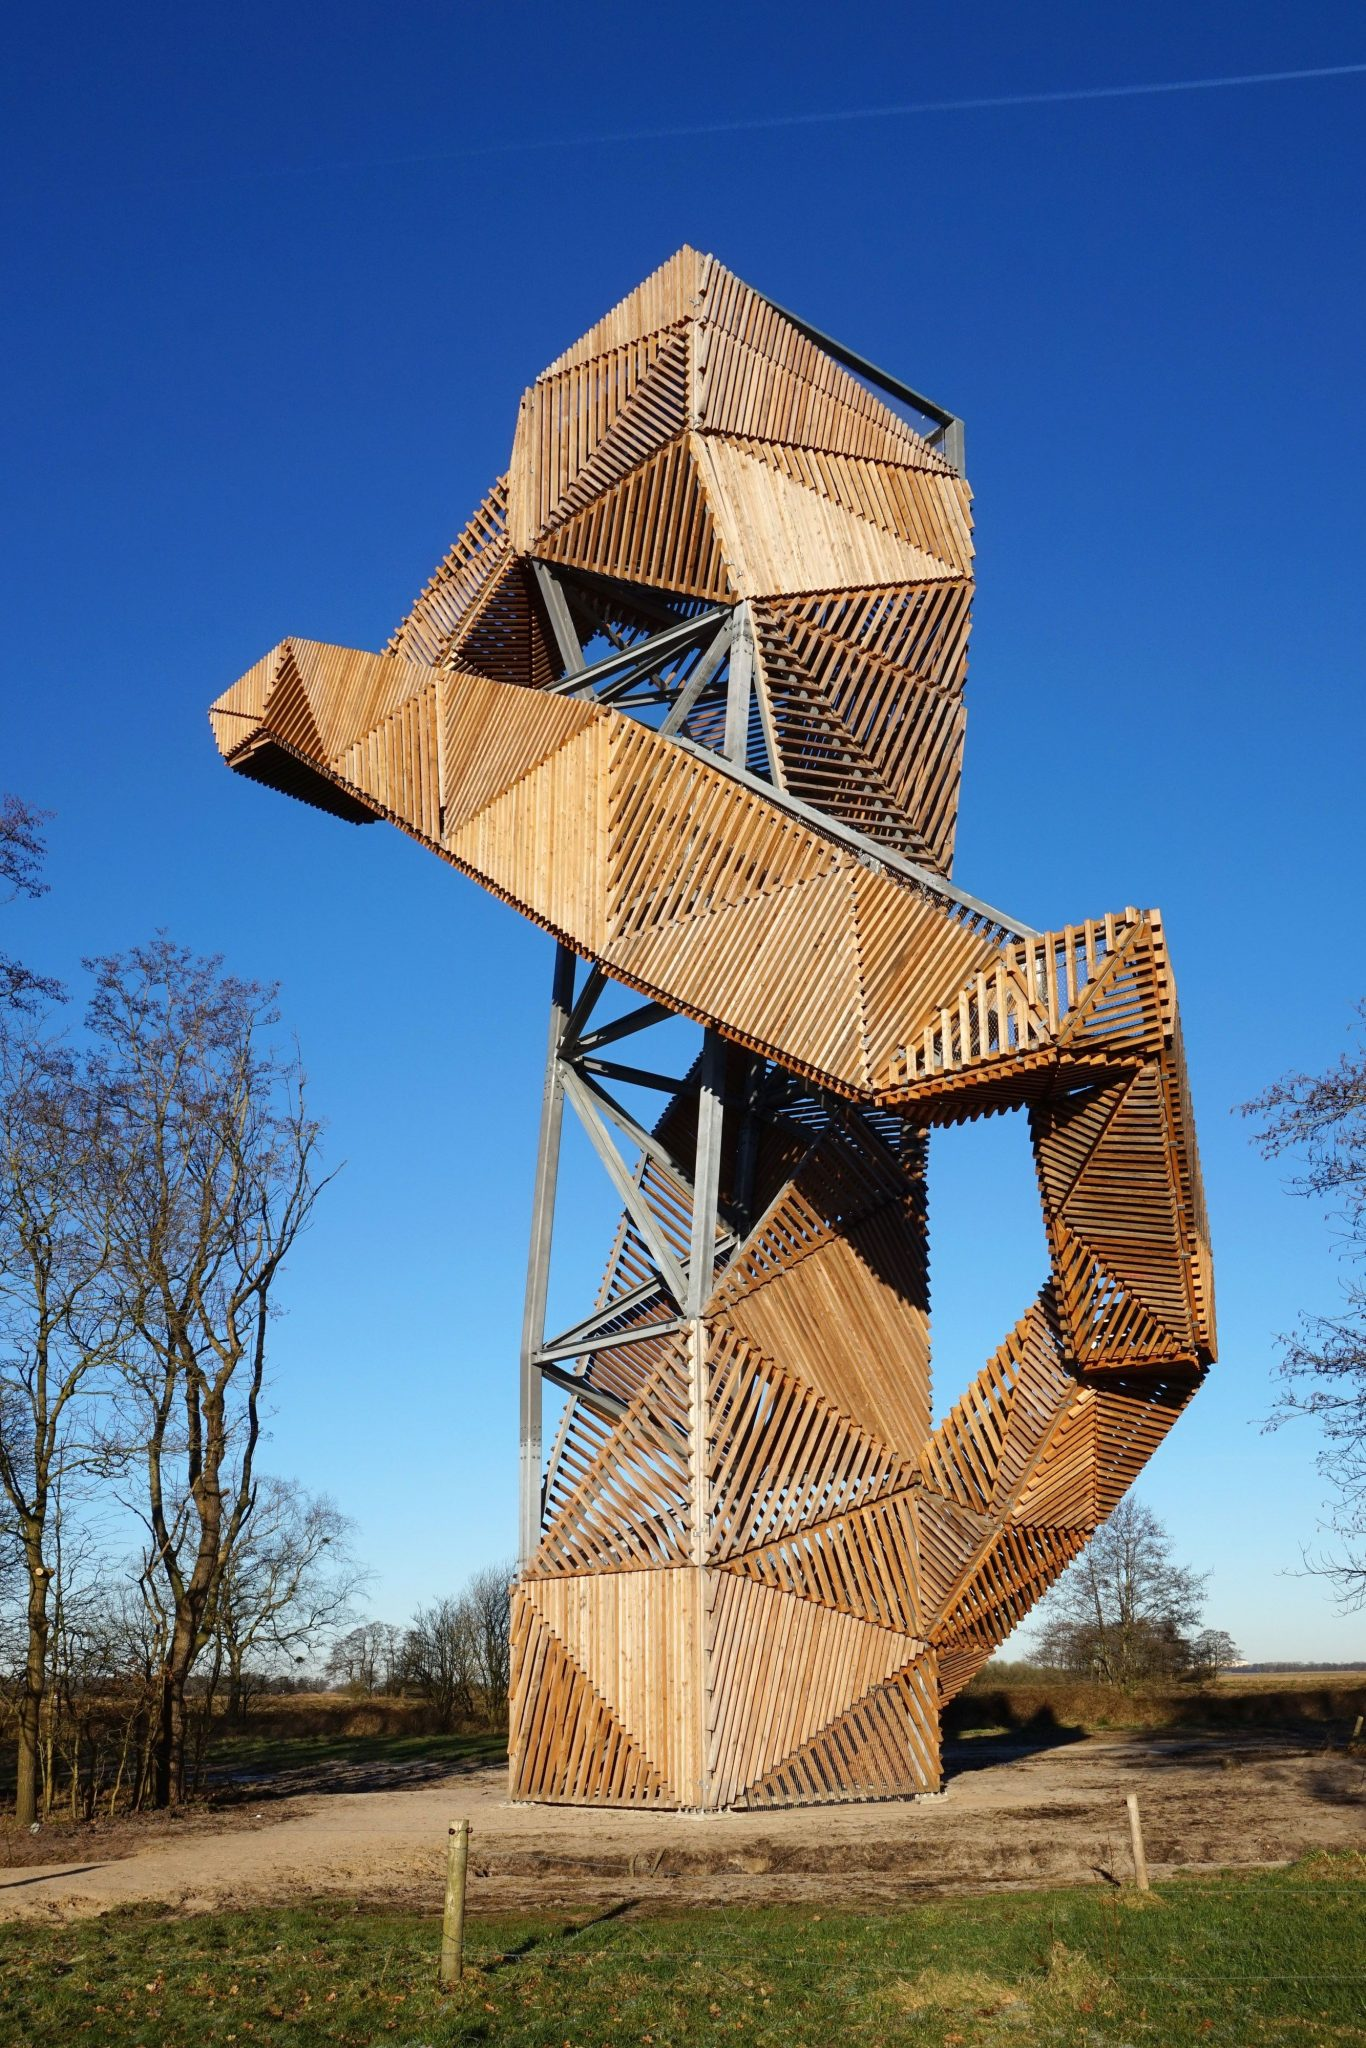 Ateliereen-uitkijktoren-onlanden-04